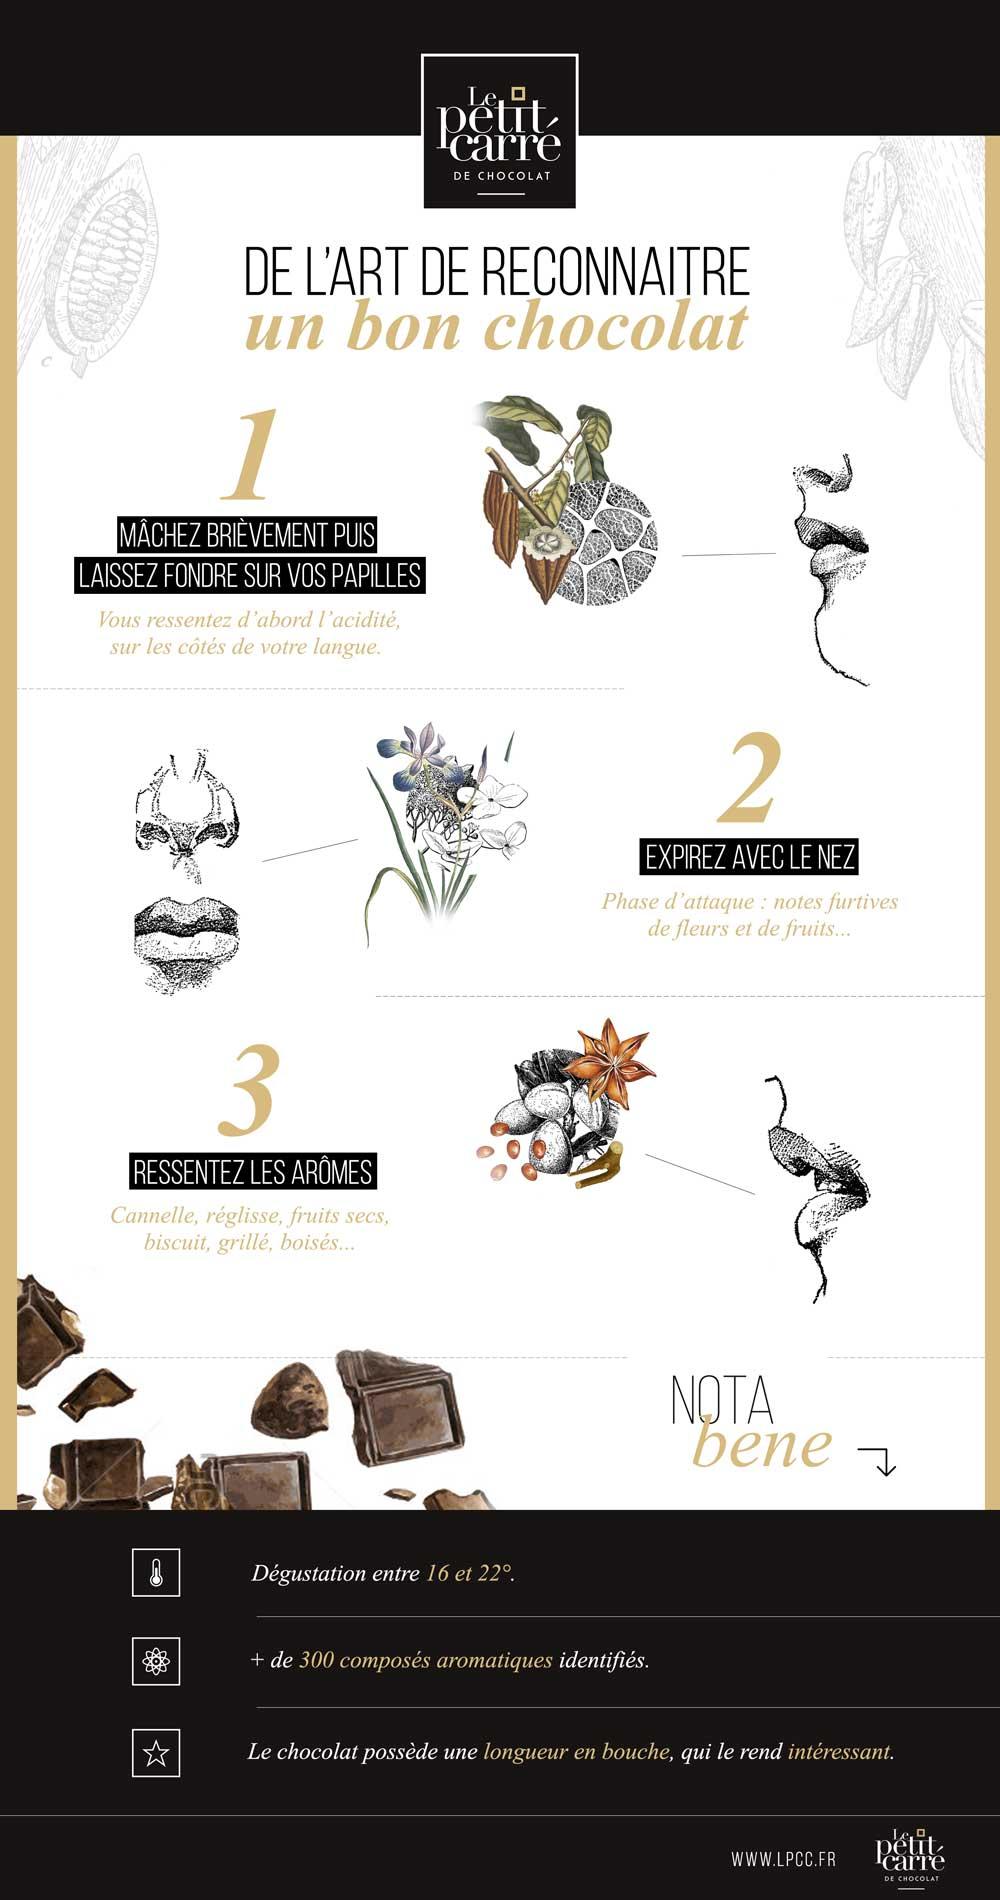 Dégustation du chocolat grand cru Le petit Carré de Chocolat